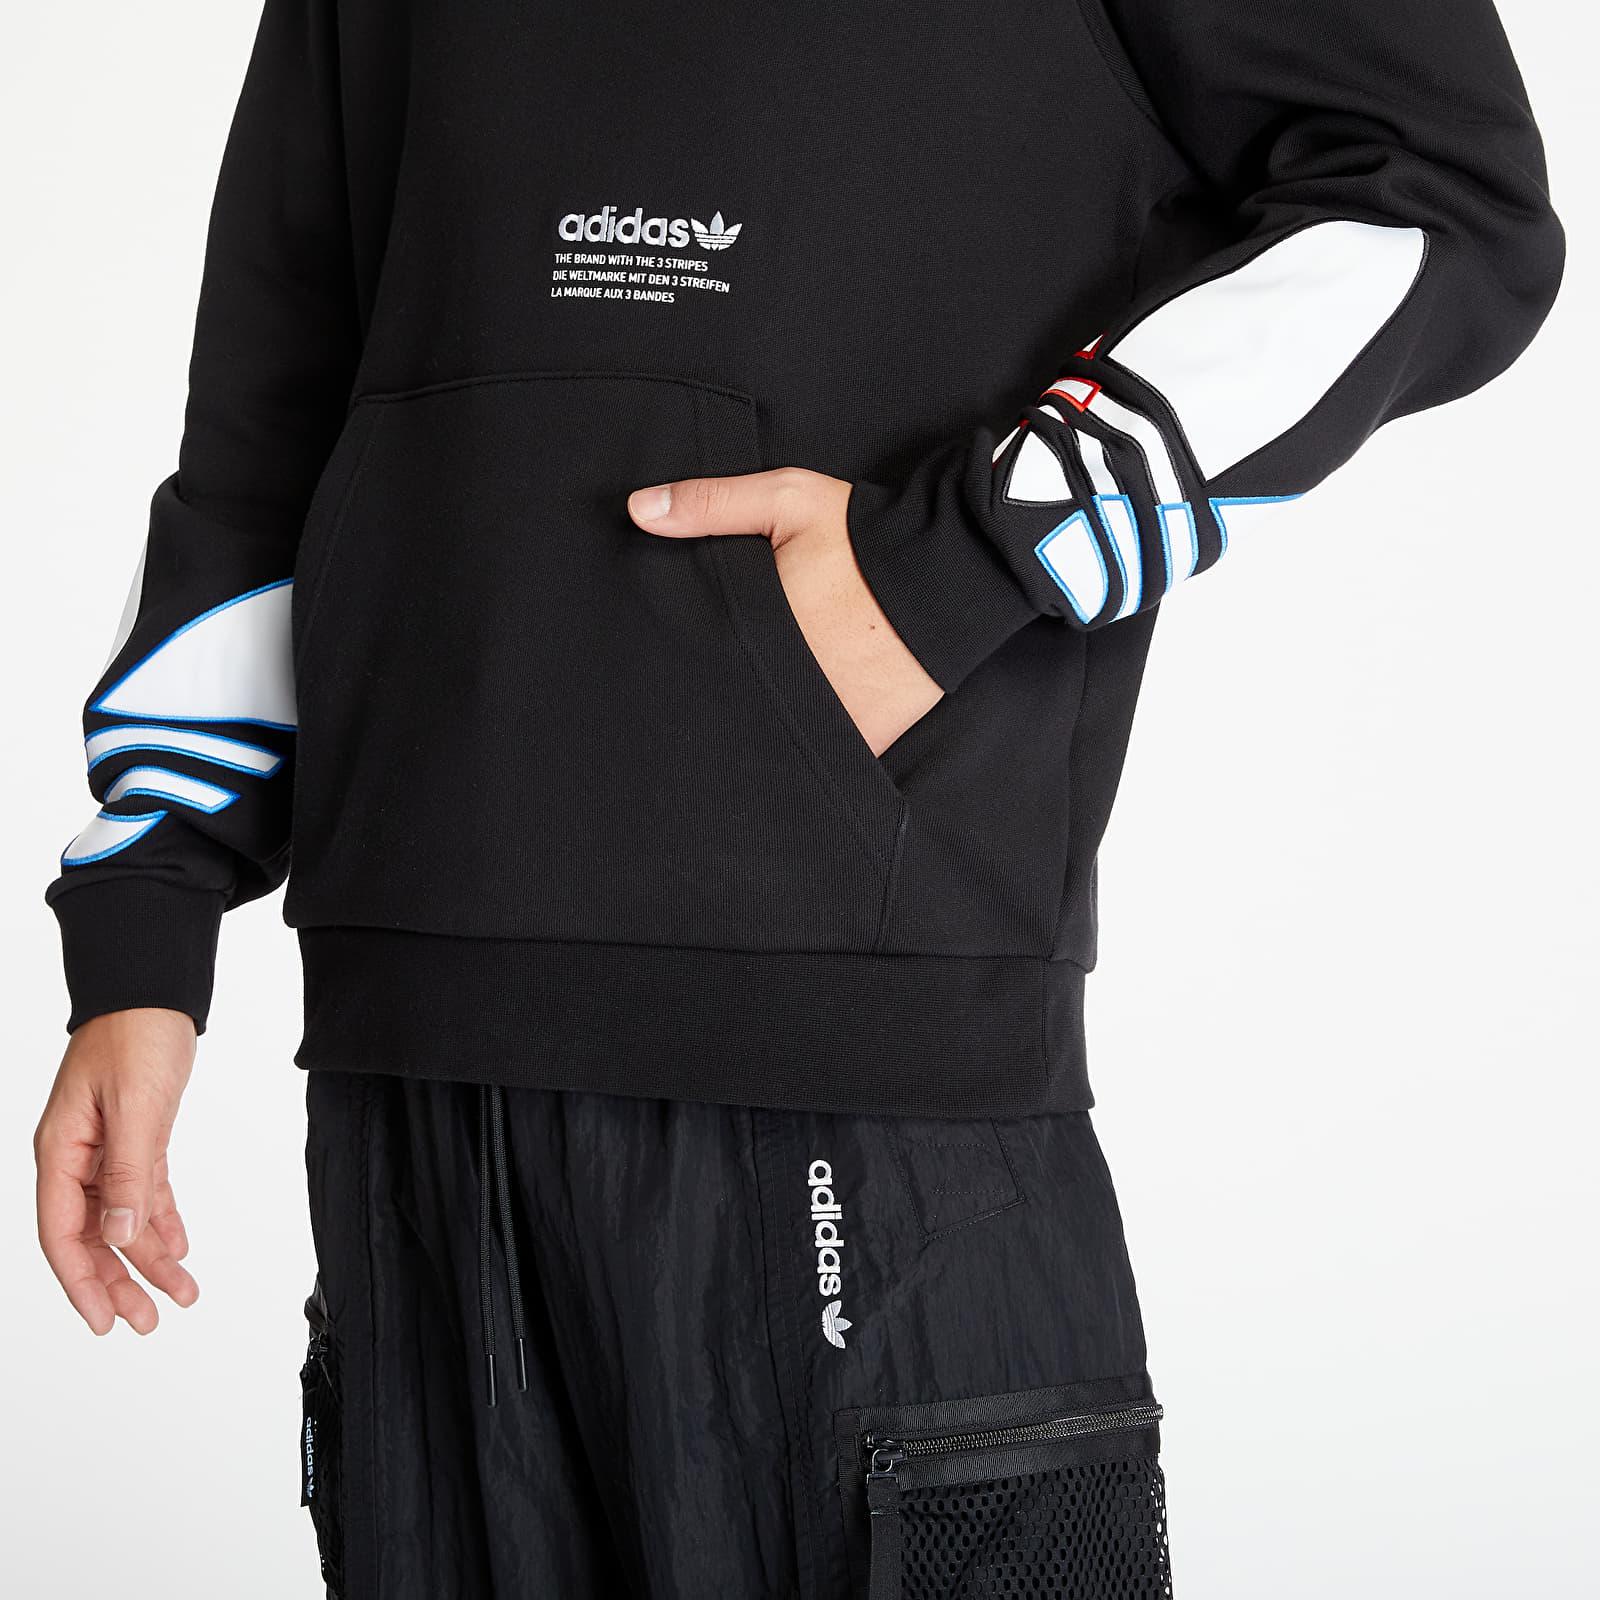 Men's Clothing adidas Tricolor Trefoil Hoodie Black